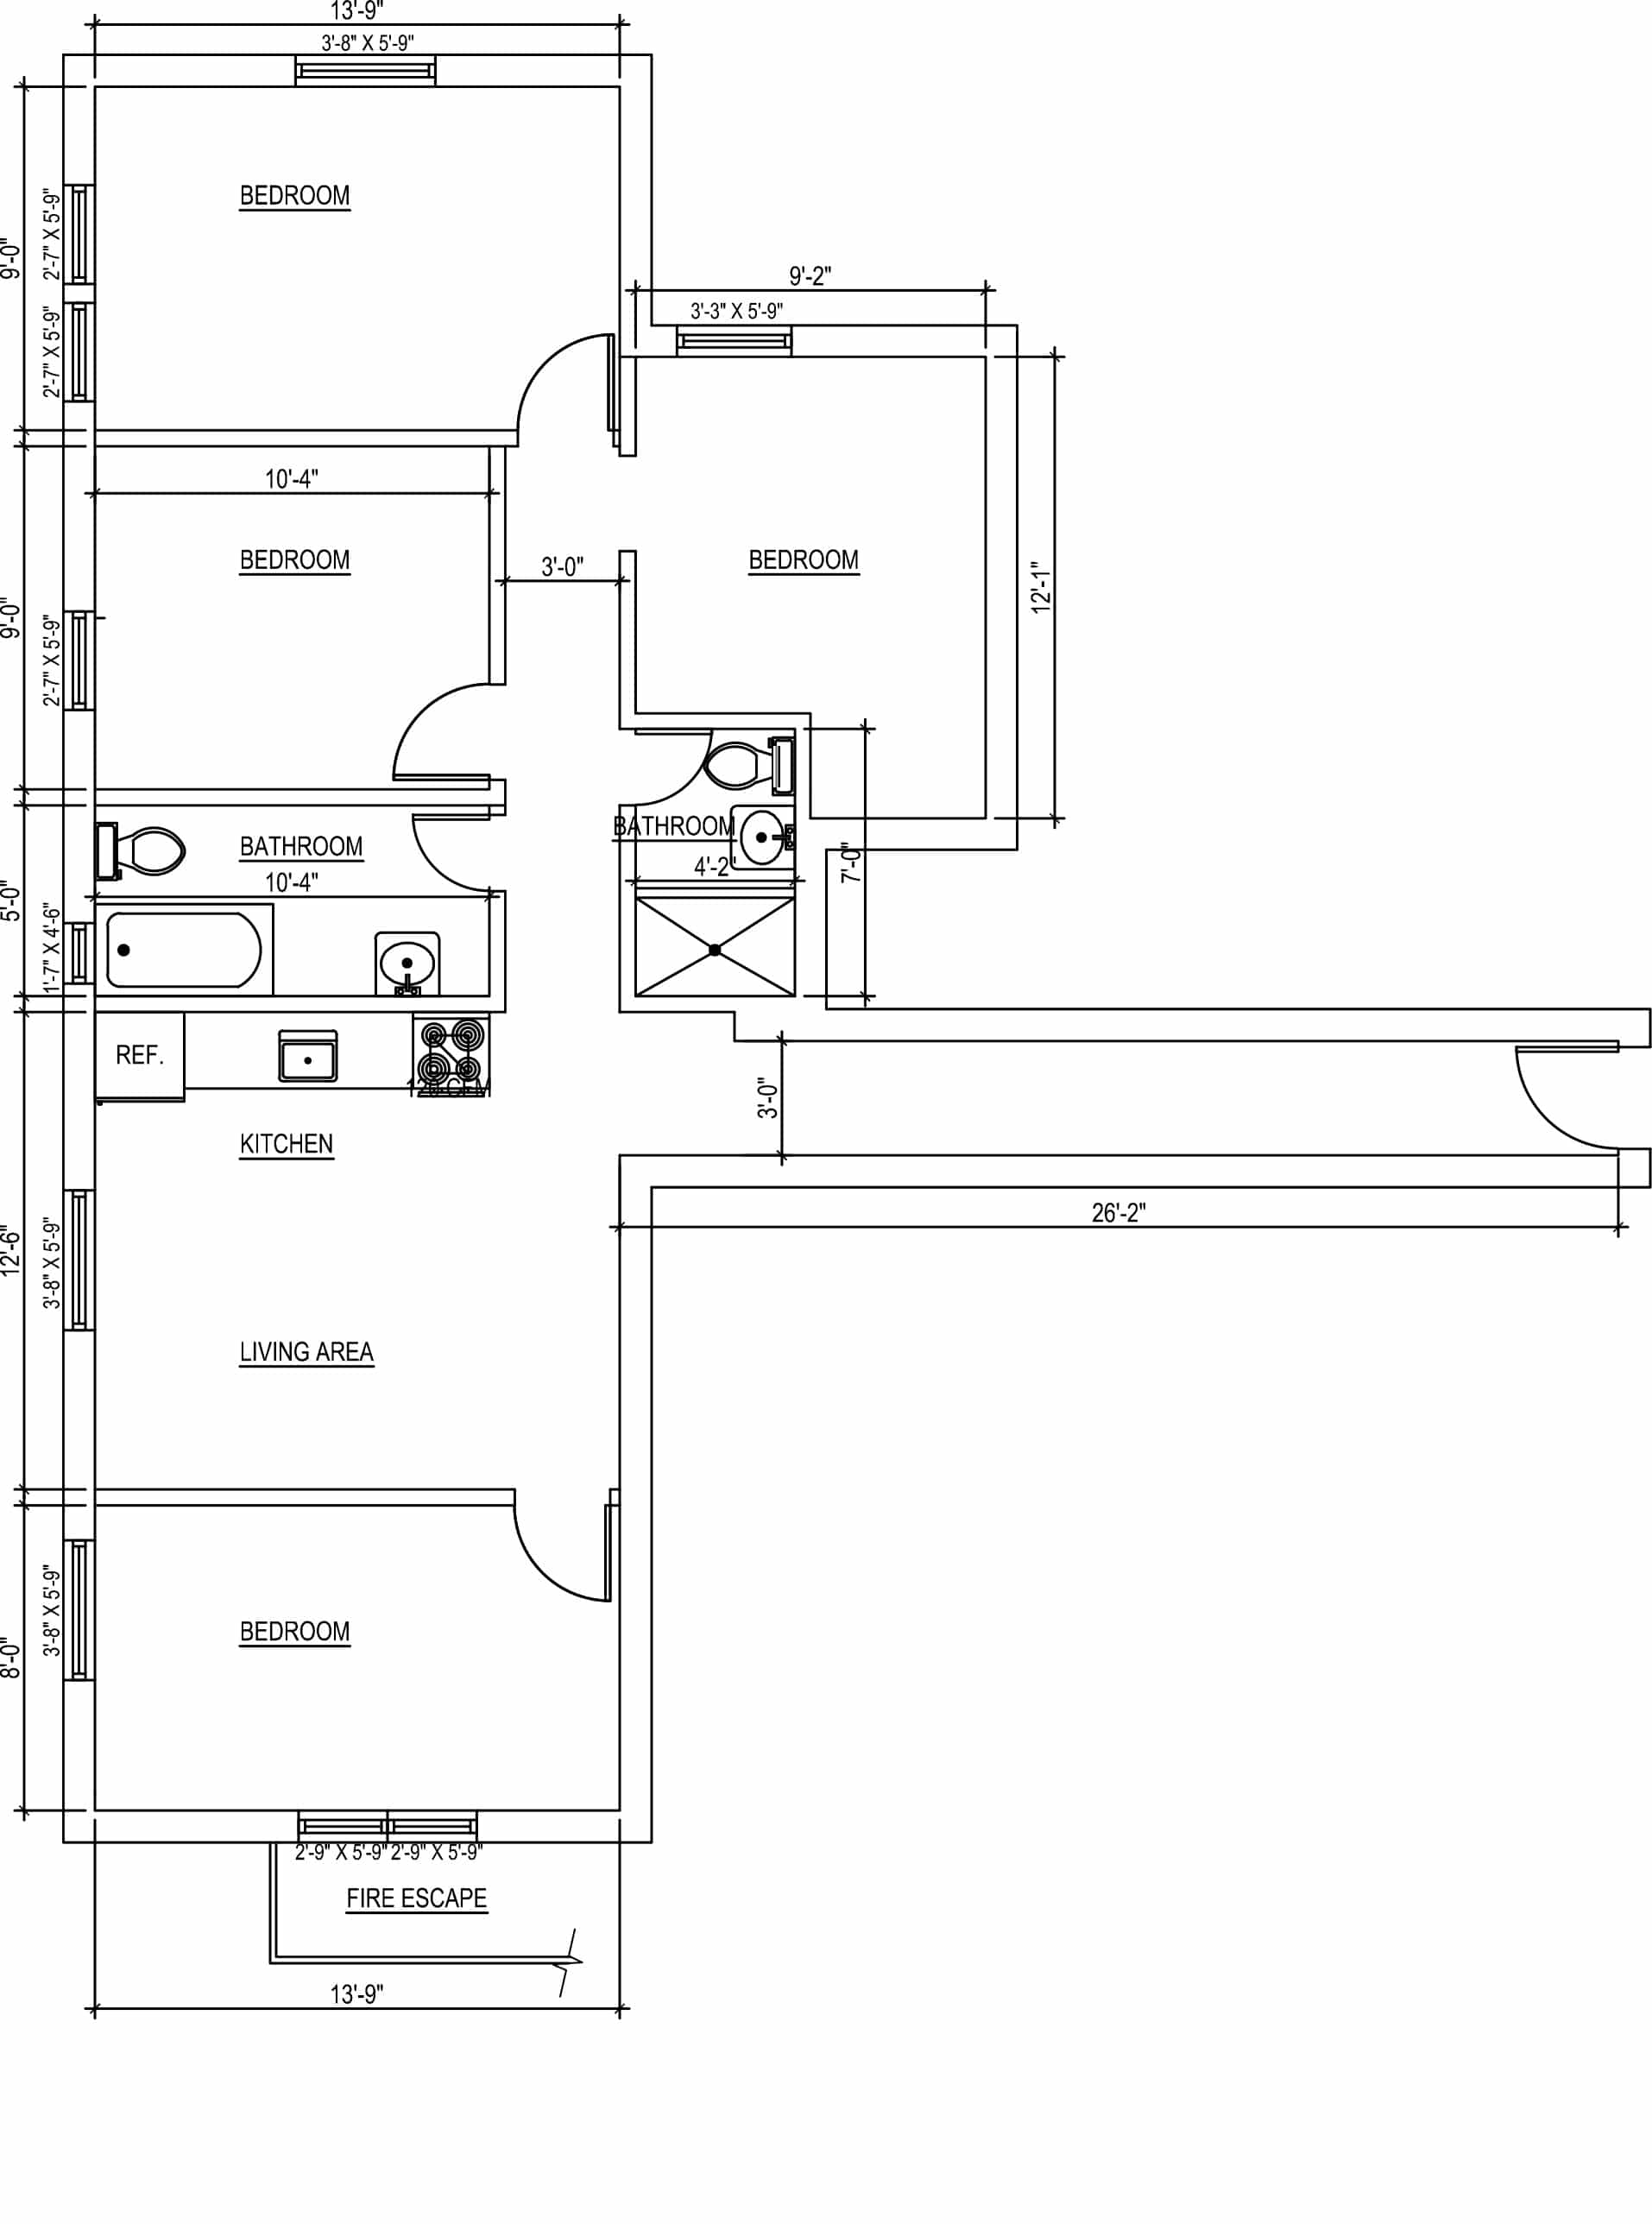 815 West 180th Street Floor Plan